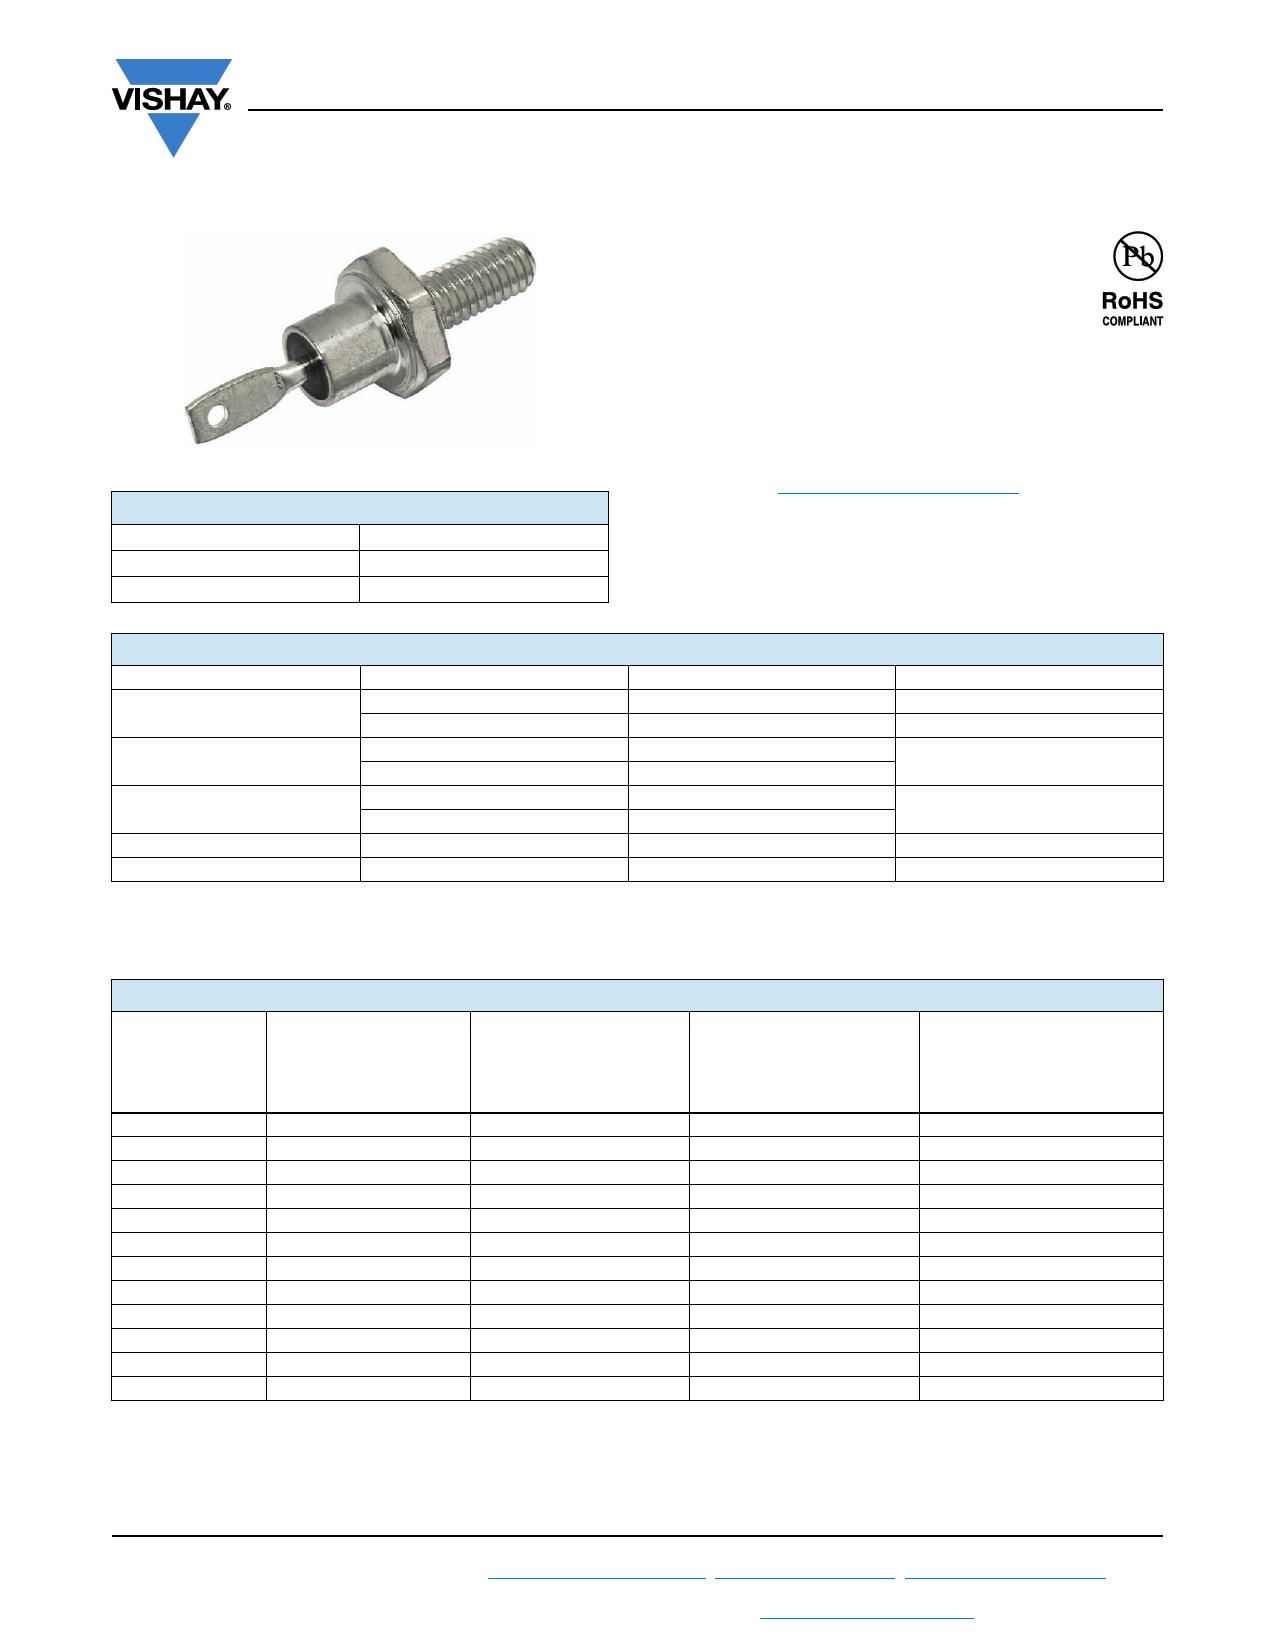 VS-1N1204A datasheet